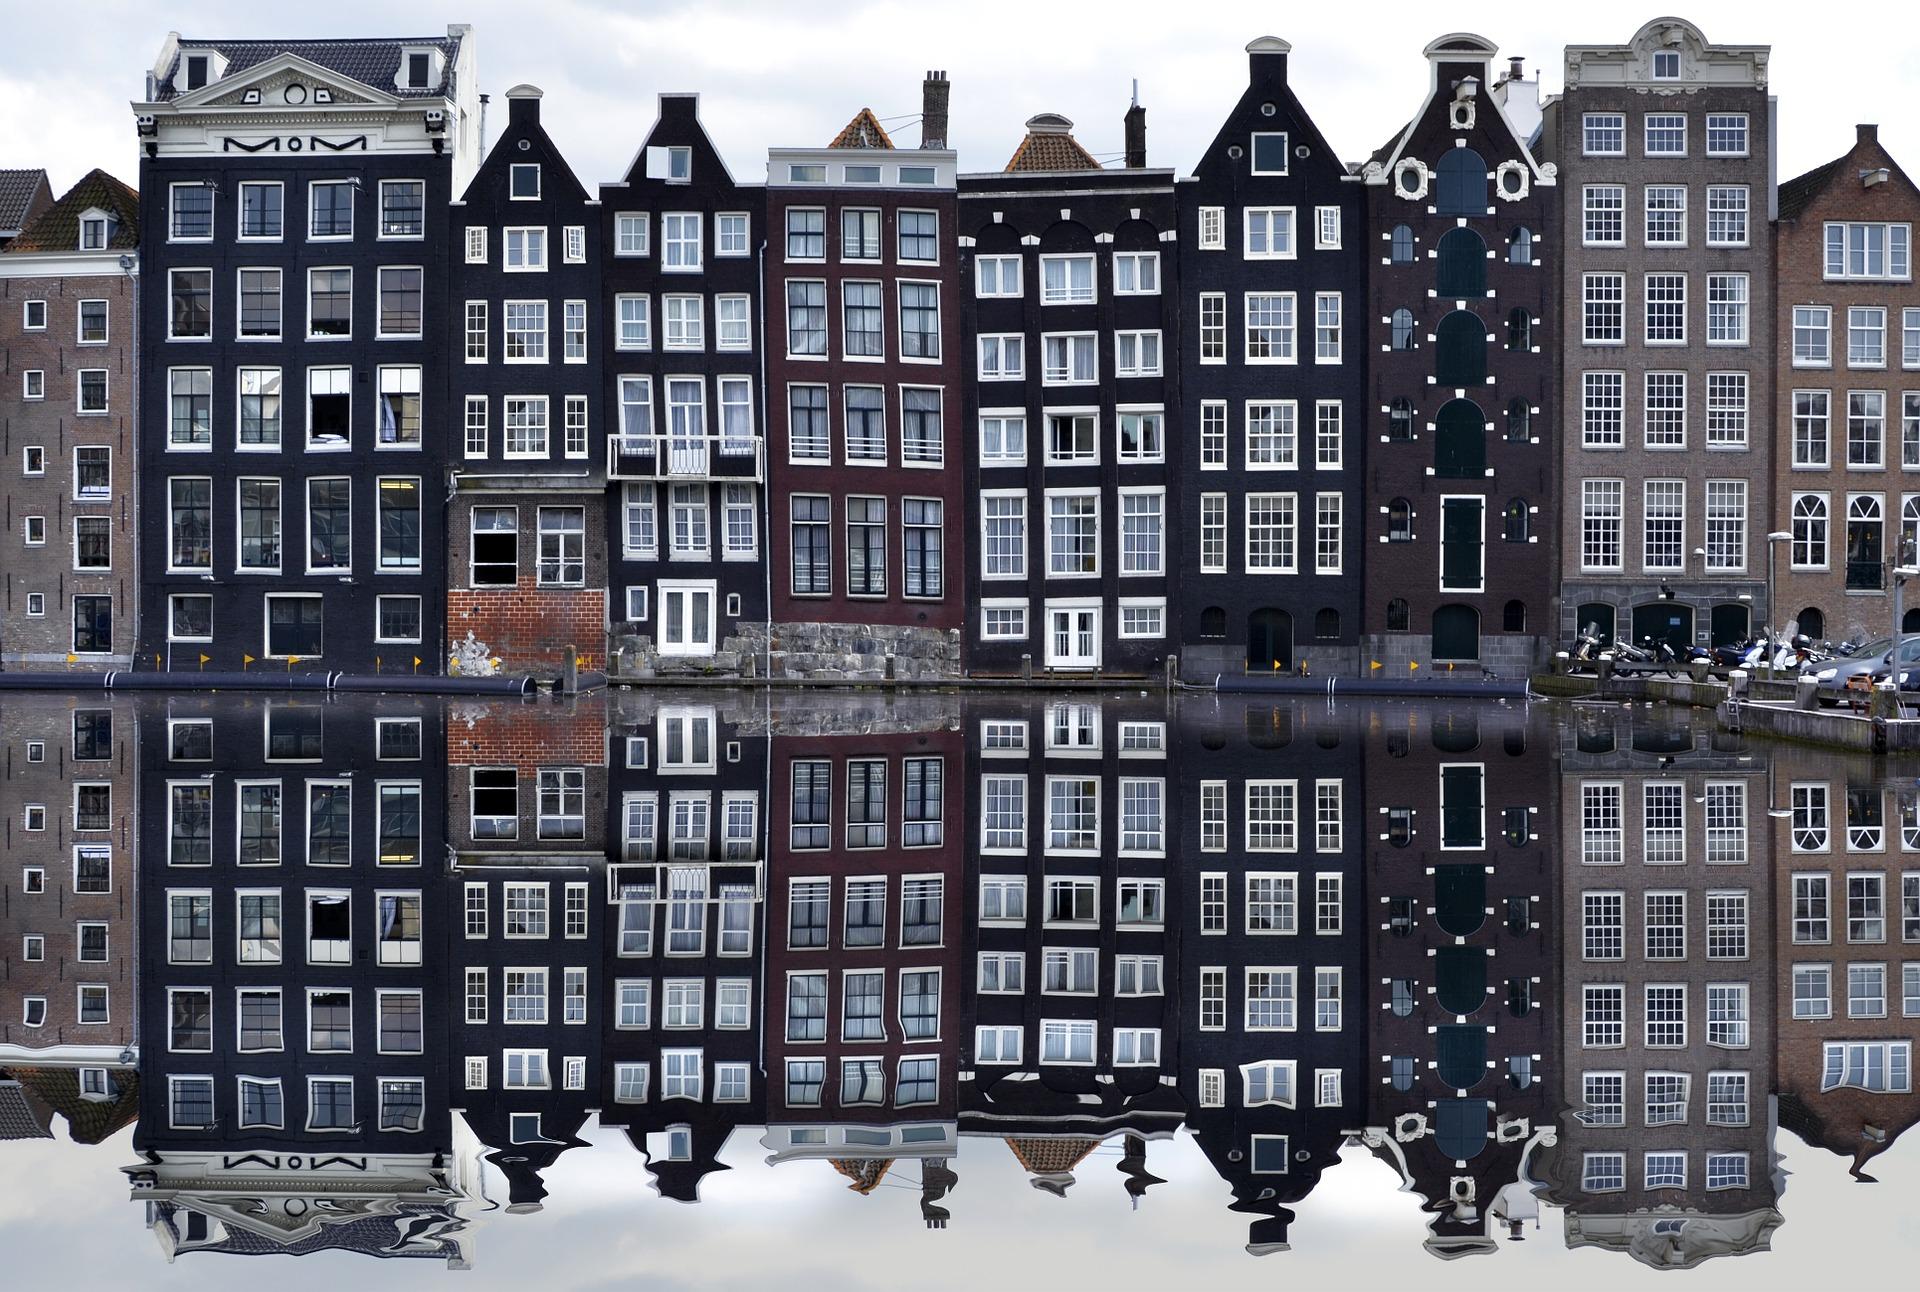 Власти Нидерландов пролили комендантский час из-за COVID-19 до утра 3 марта